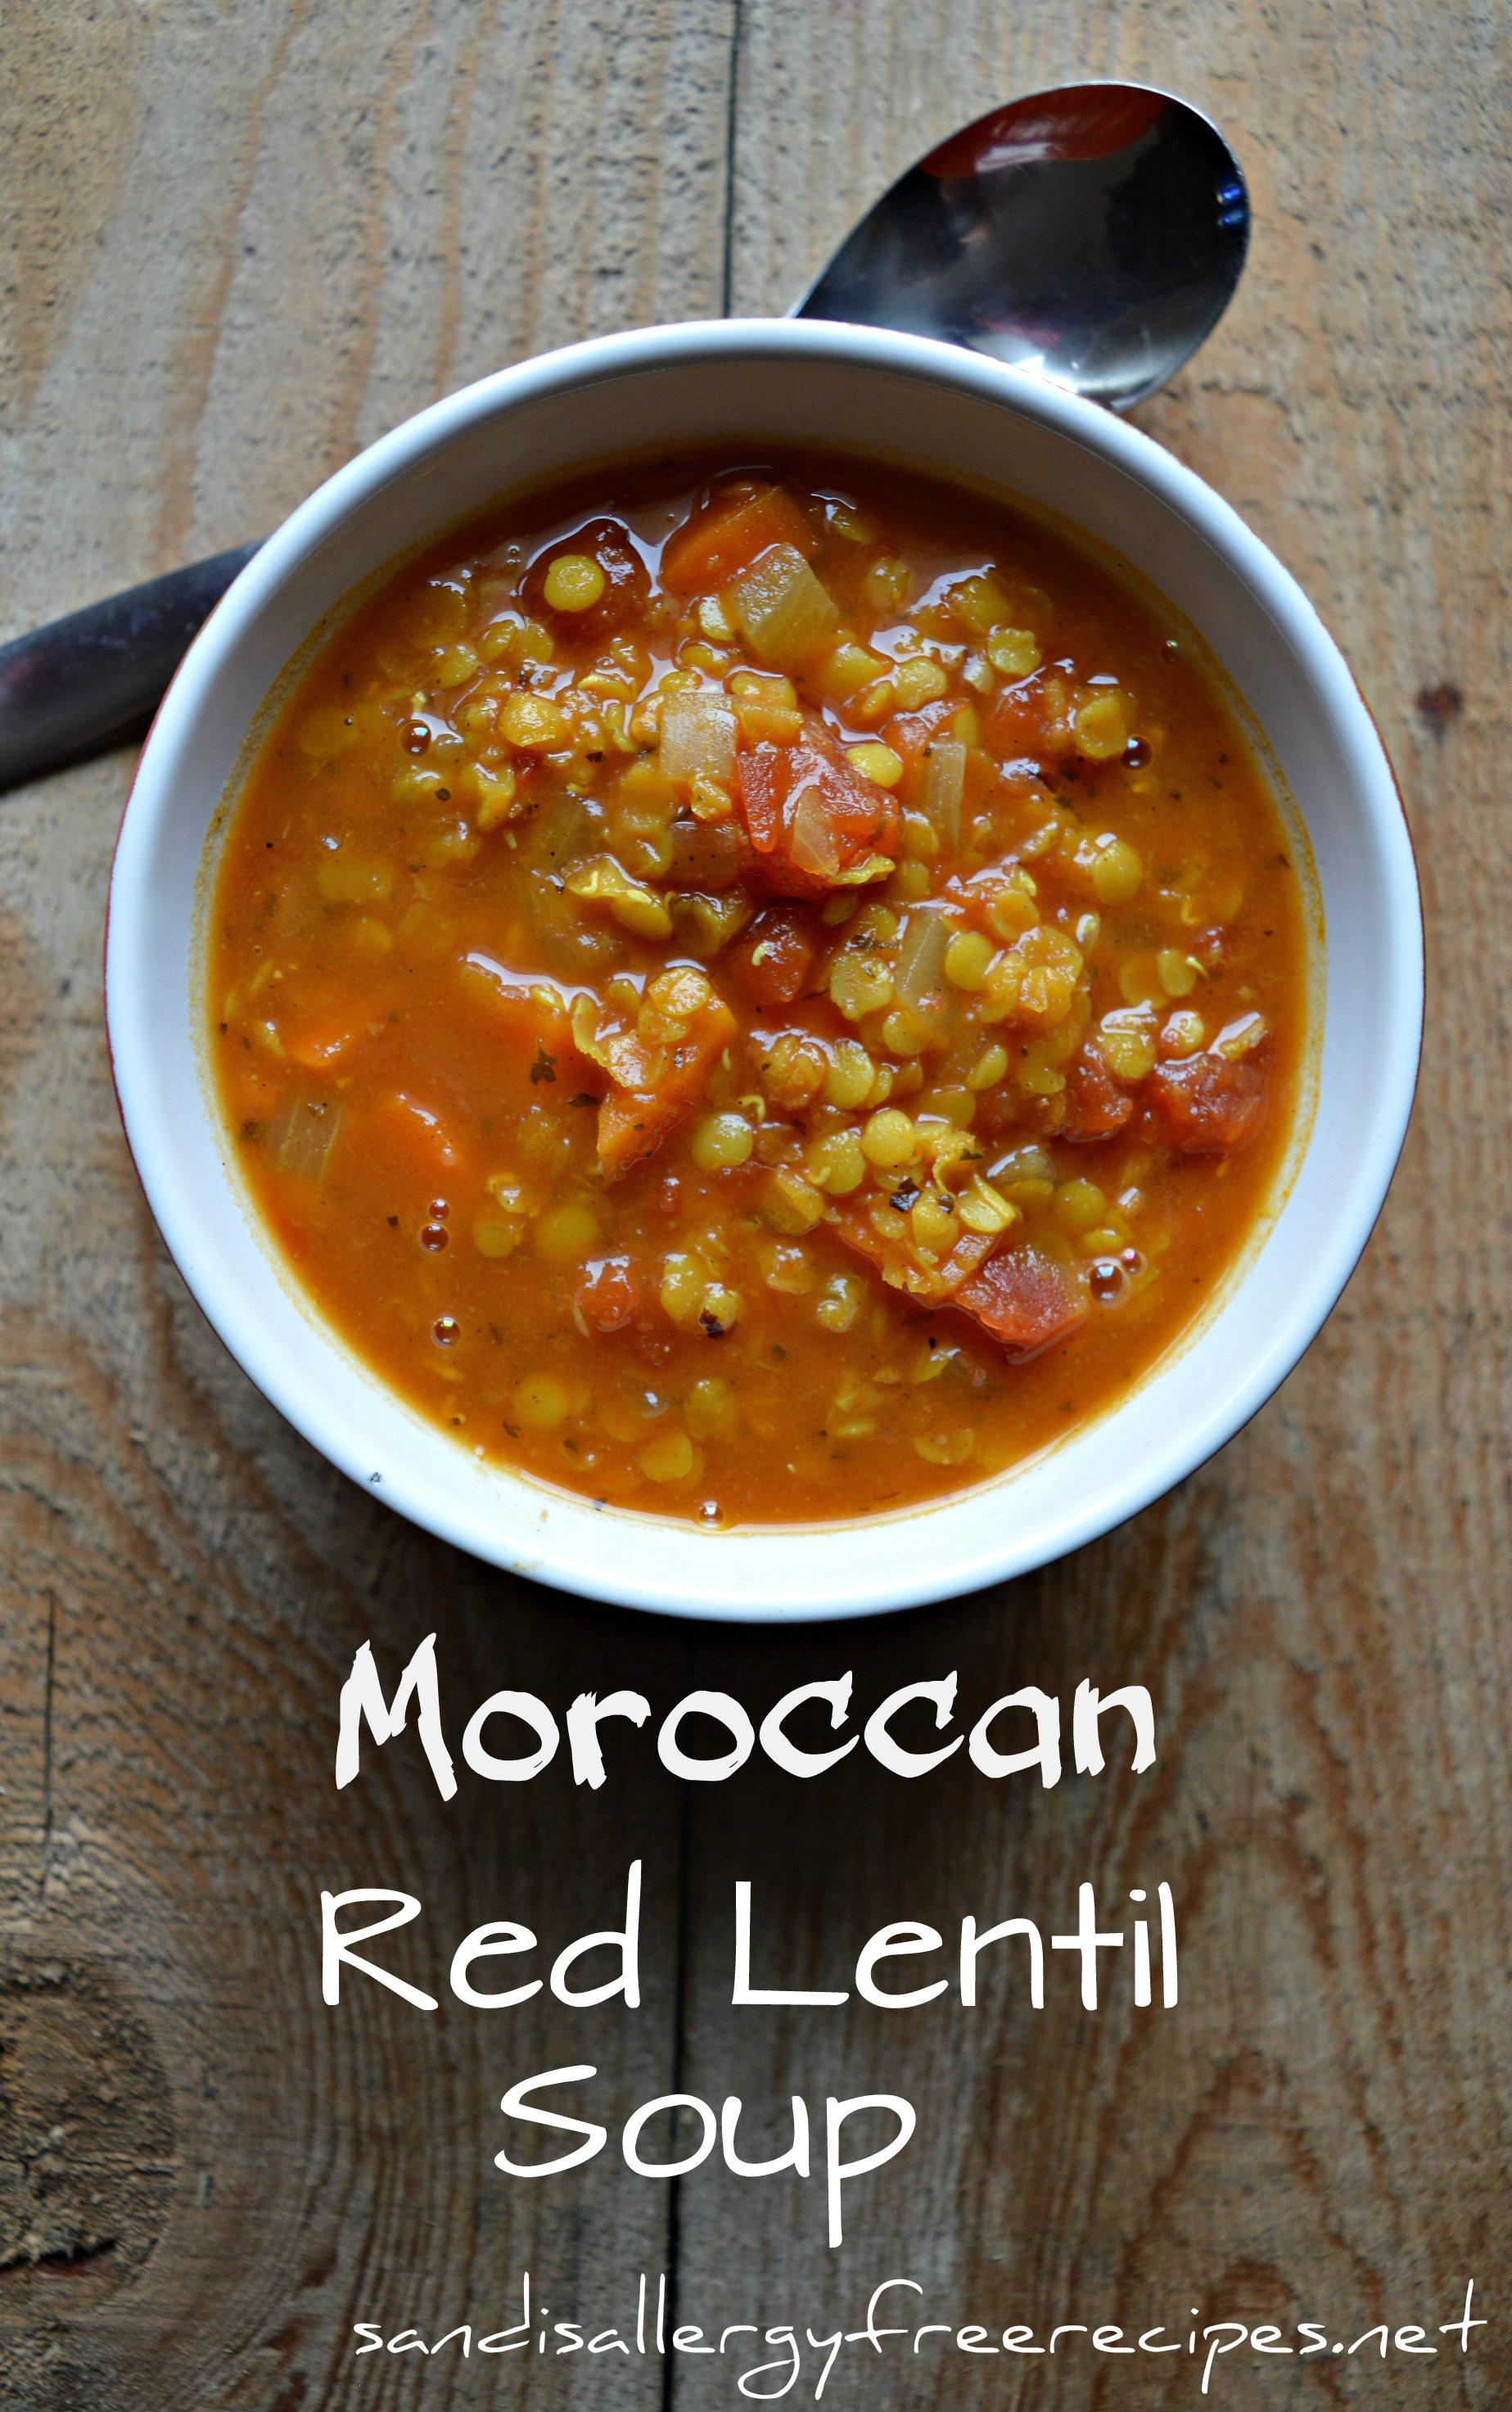 Moroccan Red Lentil Soup (Vegan/ Gluten Free/ Dairy Free/ Nut Free ...